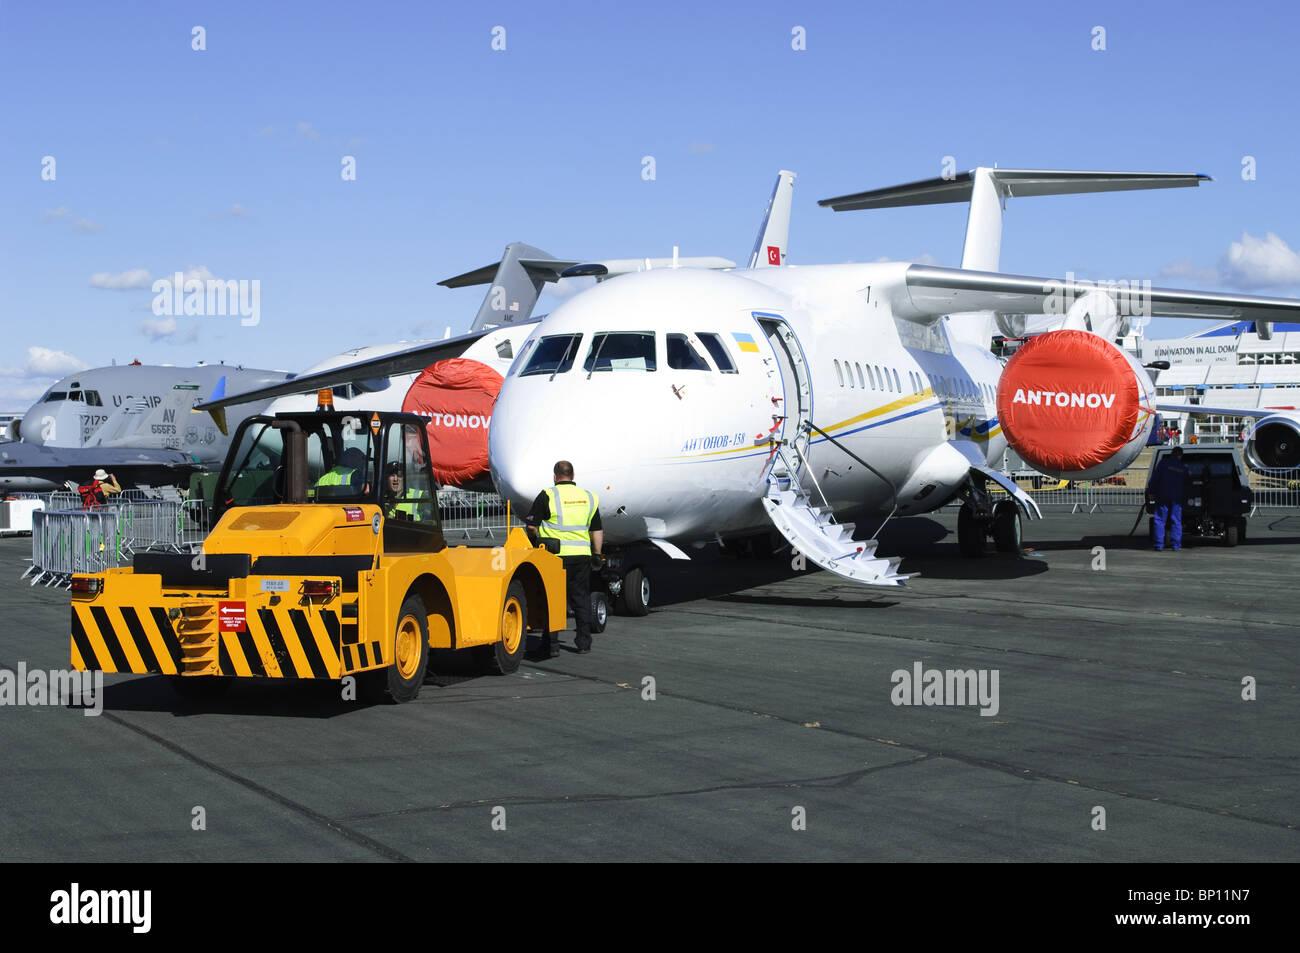 Antonov An-158 awaiting tow by a Hallam Terrier HE aircraft tug at Farnborough Airshow - Stock Image